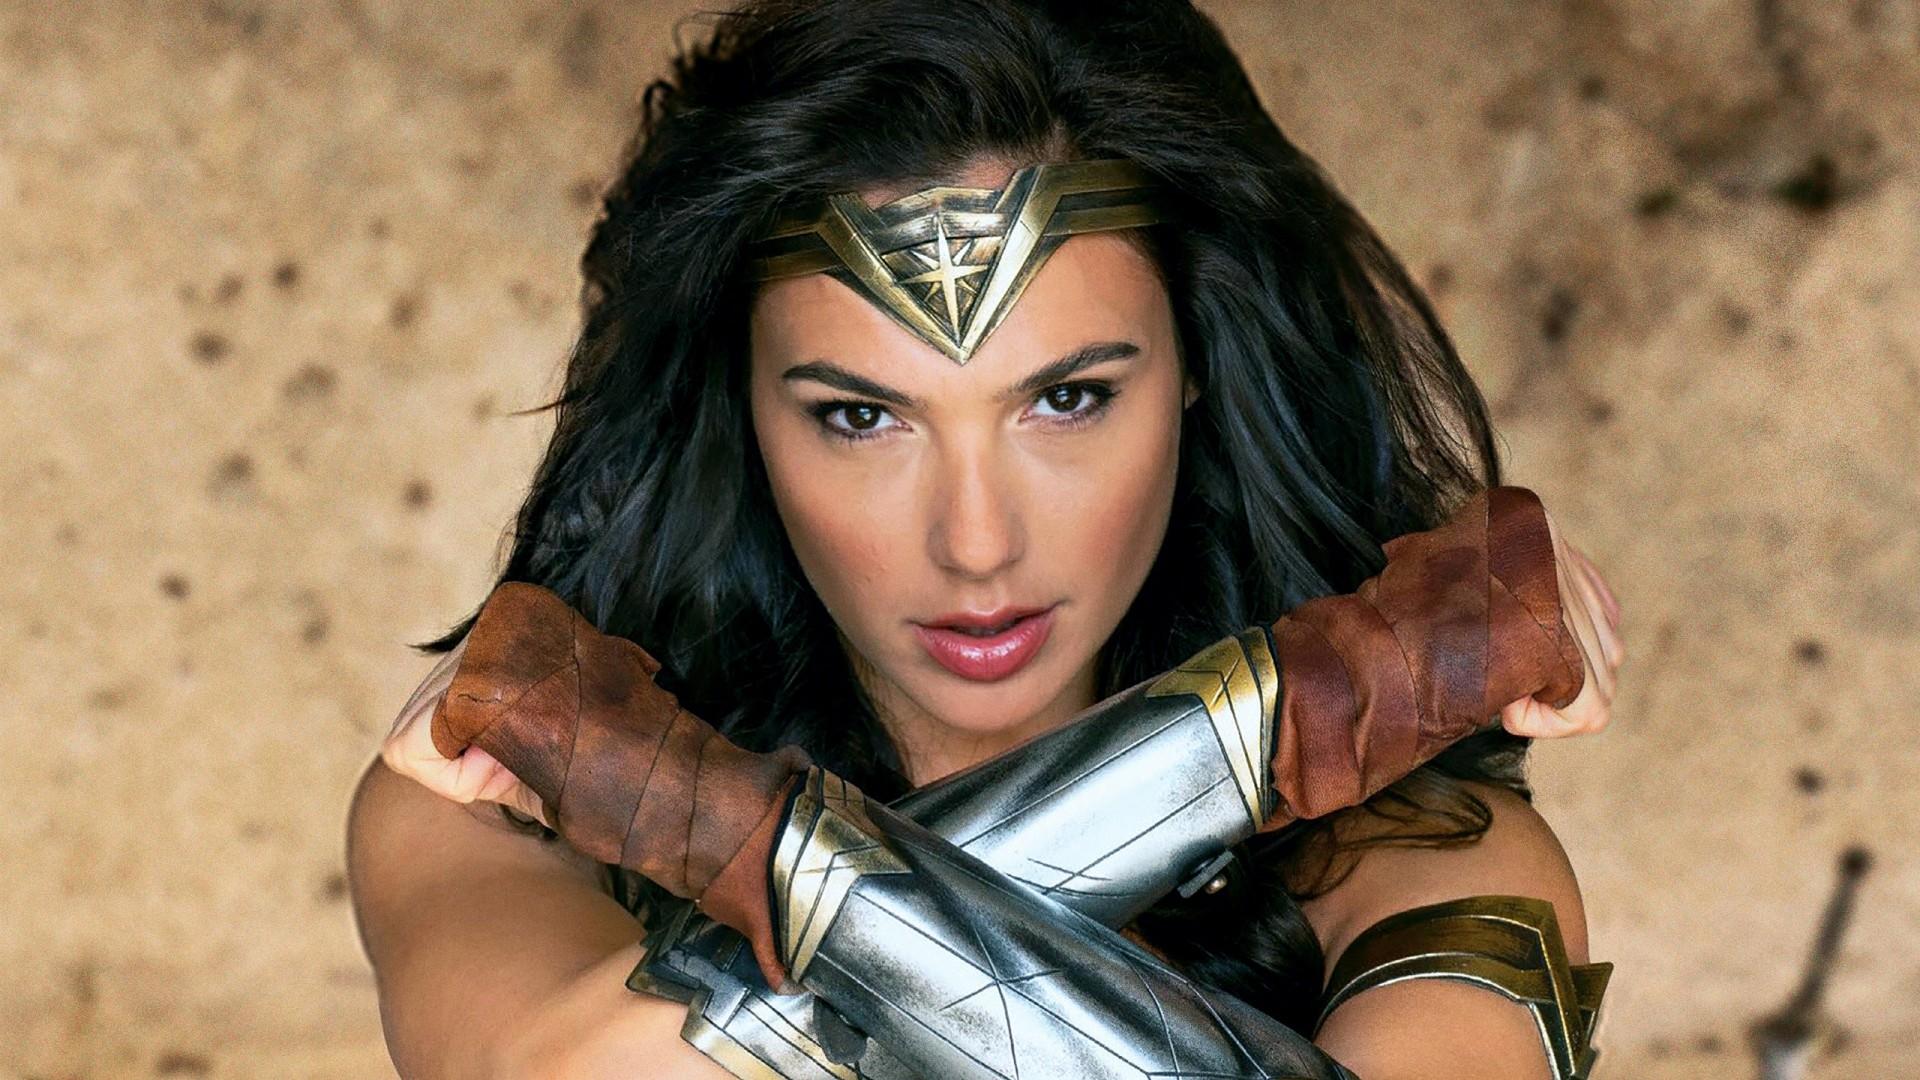 Wonder Woman Movie Gal Gadot Wallpaper   Wallpaper Stream 1920x1080